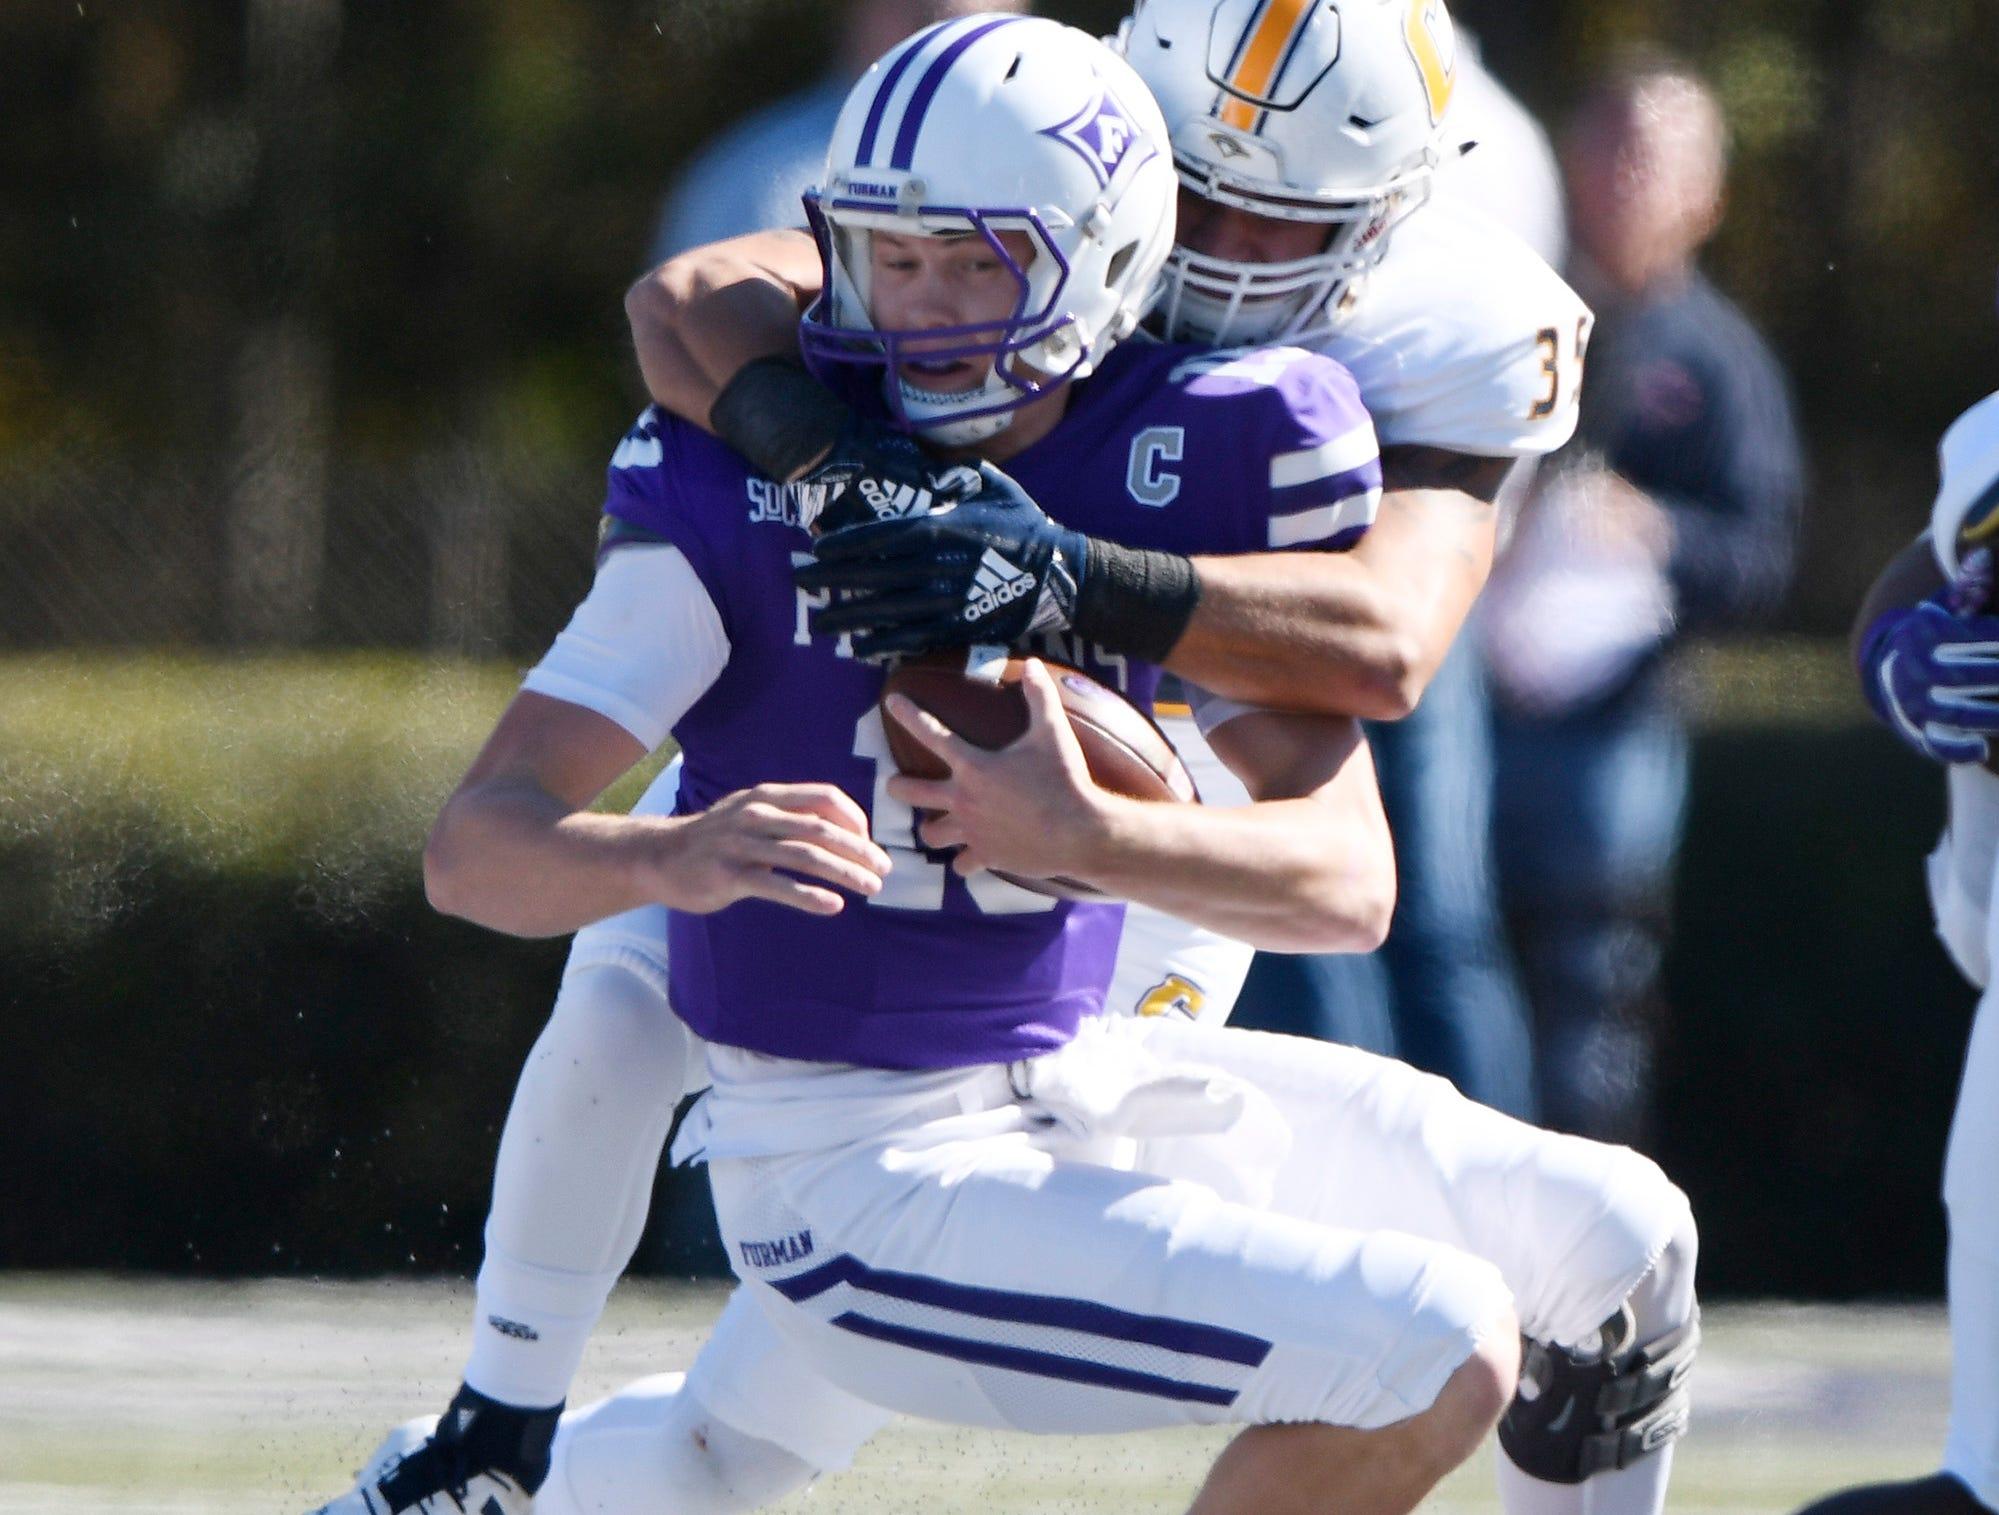 Furman quarterback Harris Roberts (15) is sacked by Chattanooga's Michael Bean (35) Saturday, November 3, 2018, at Paladin Stadium.